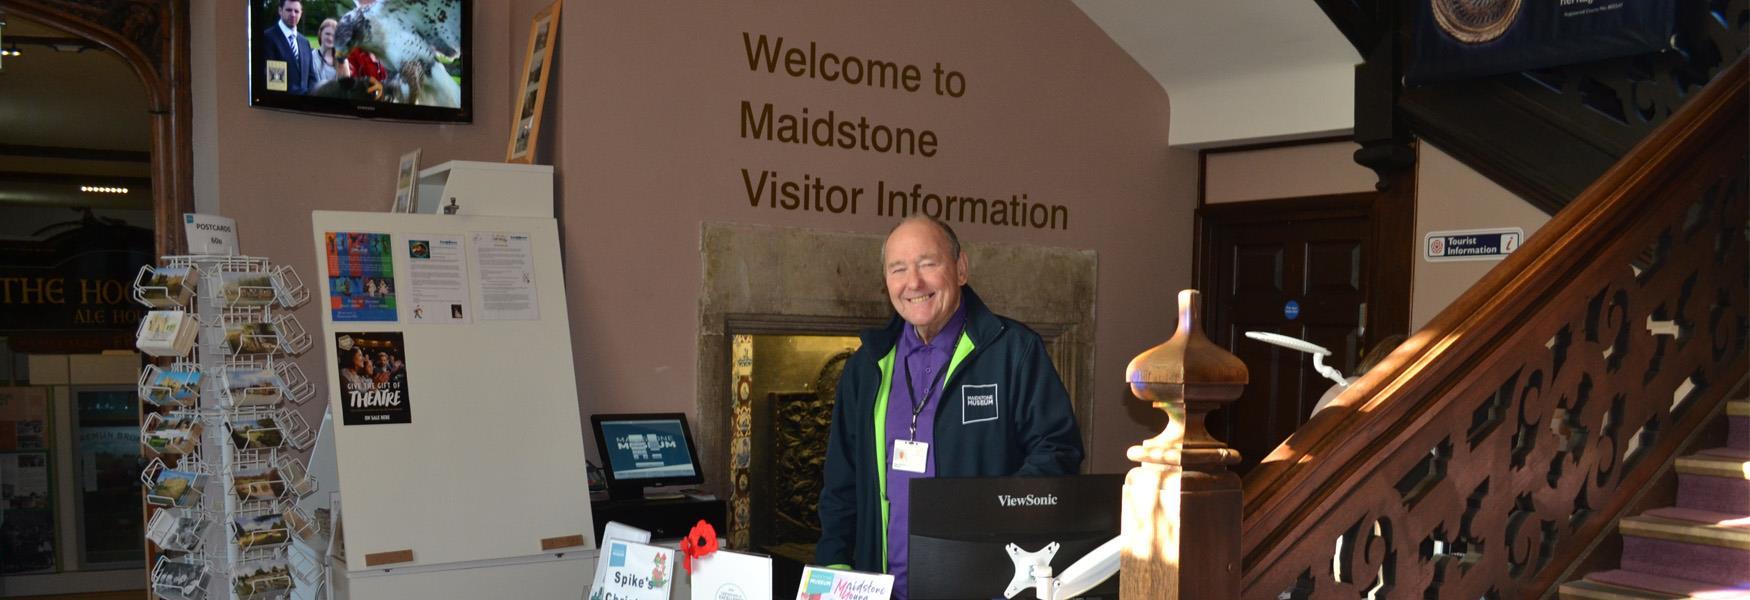 Here to help - Maidstone Tourist Information